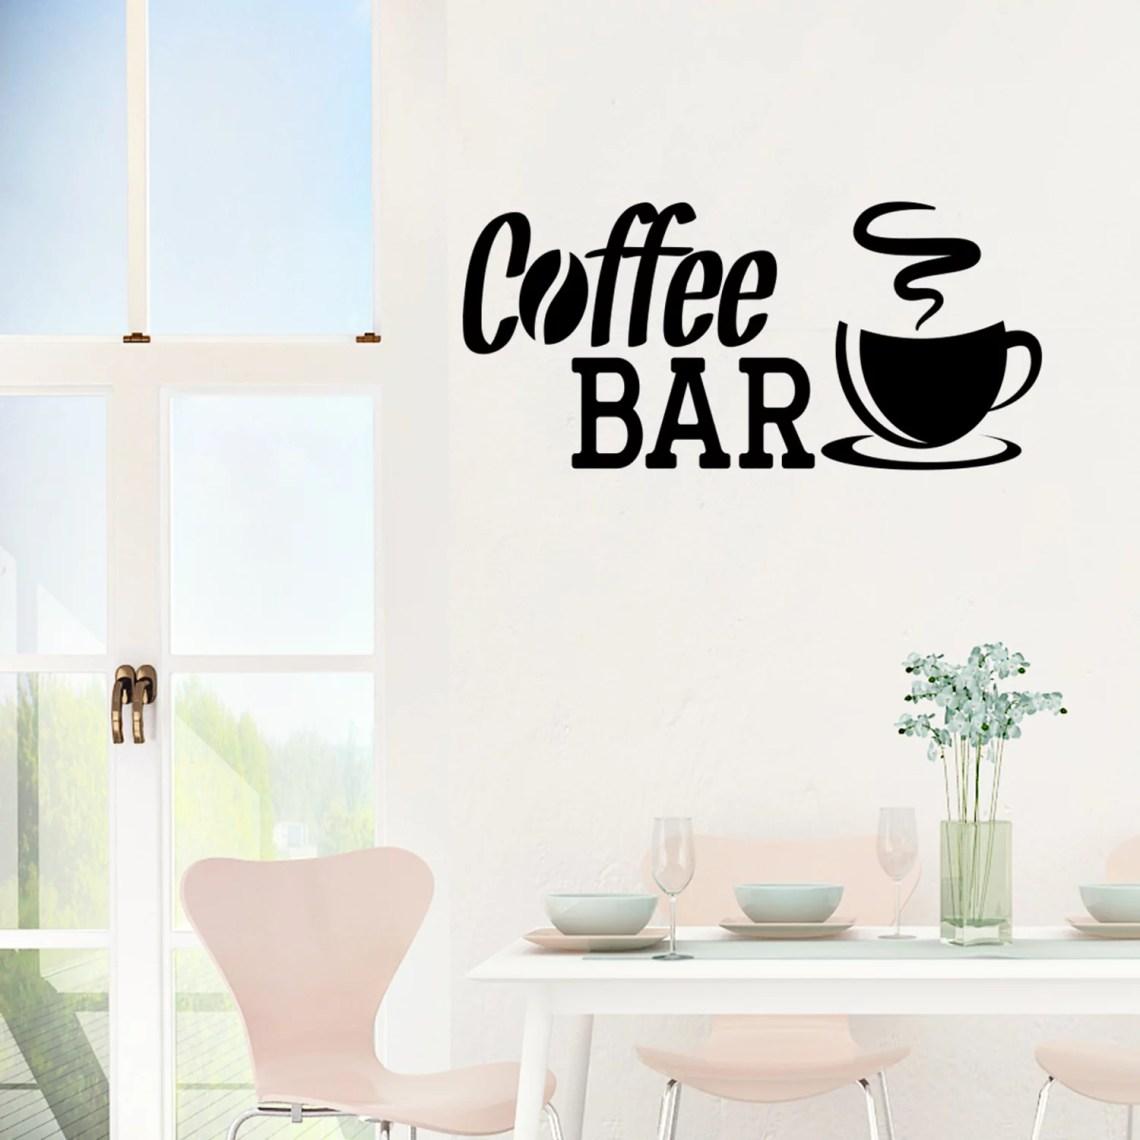 Coffee Bar Wall Decal Quote Pantry Wall Art Stickers Kitchen Wall Decor Jm197 L Walmart Com Walmart Com